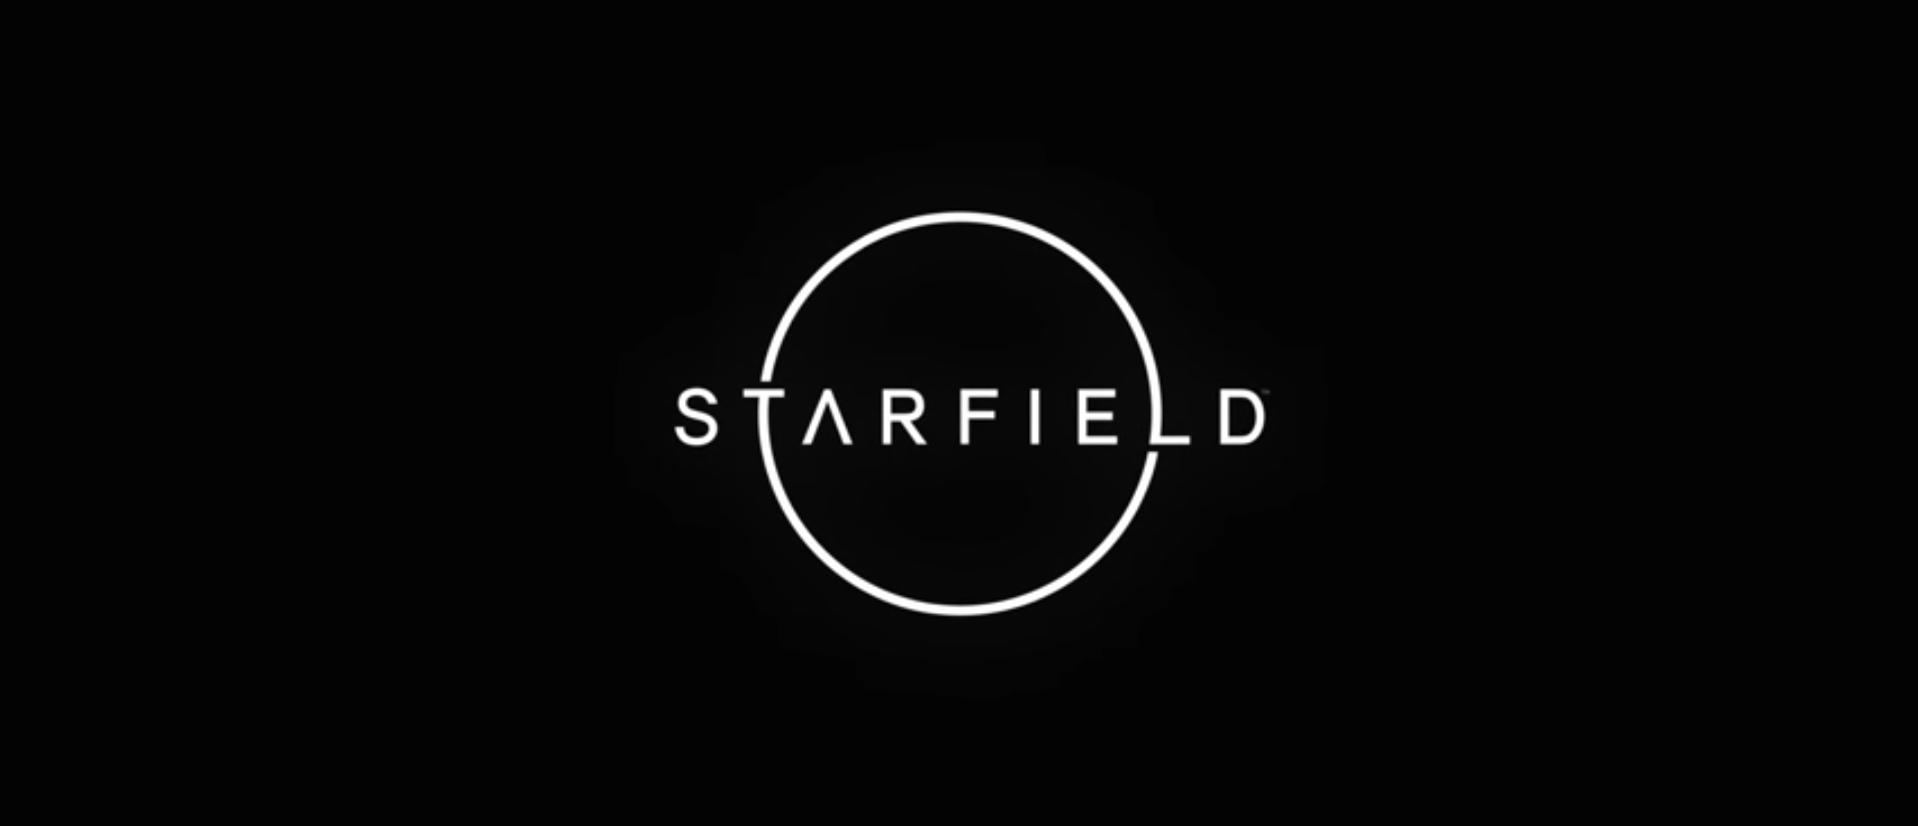 starfield-gameplay-details